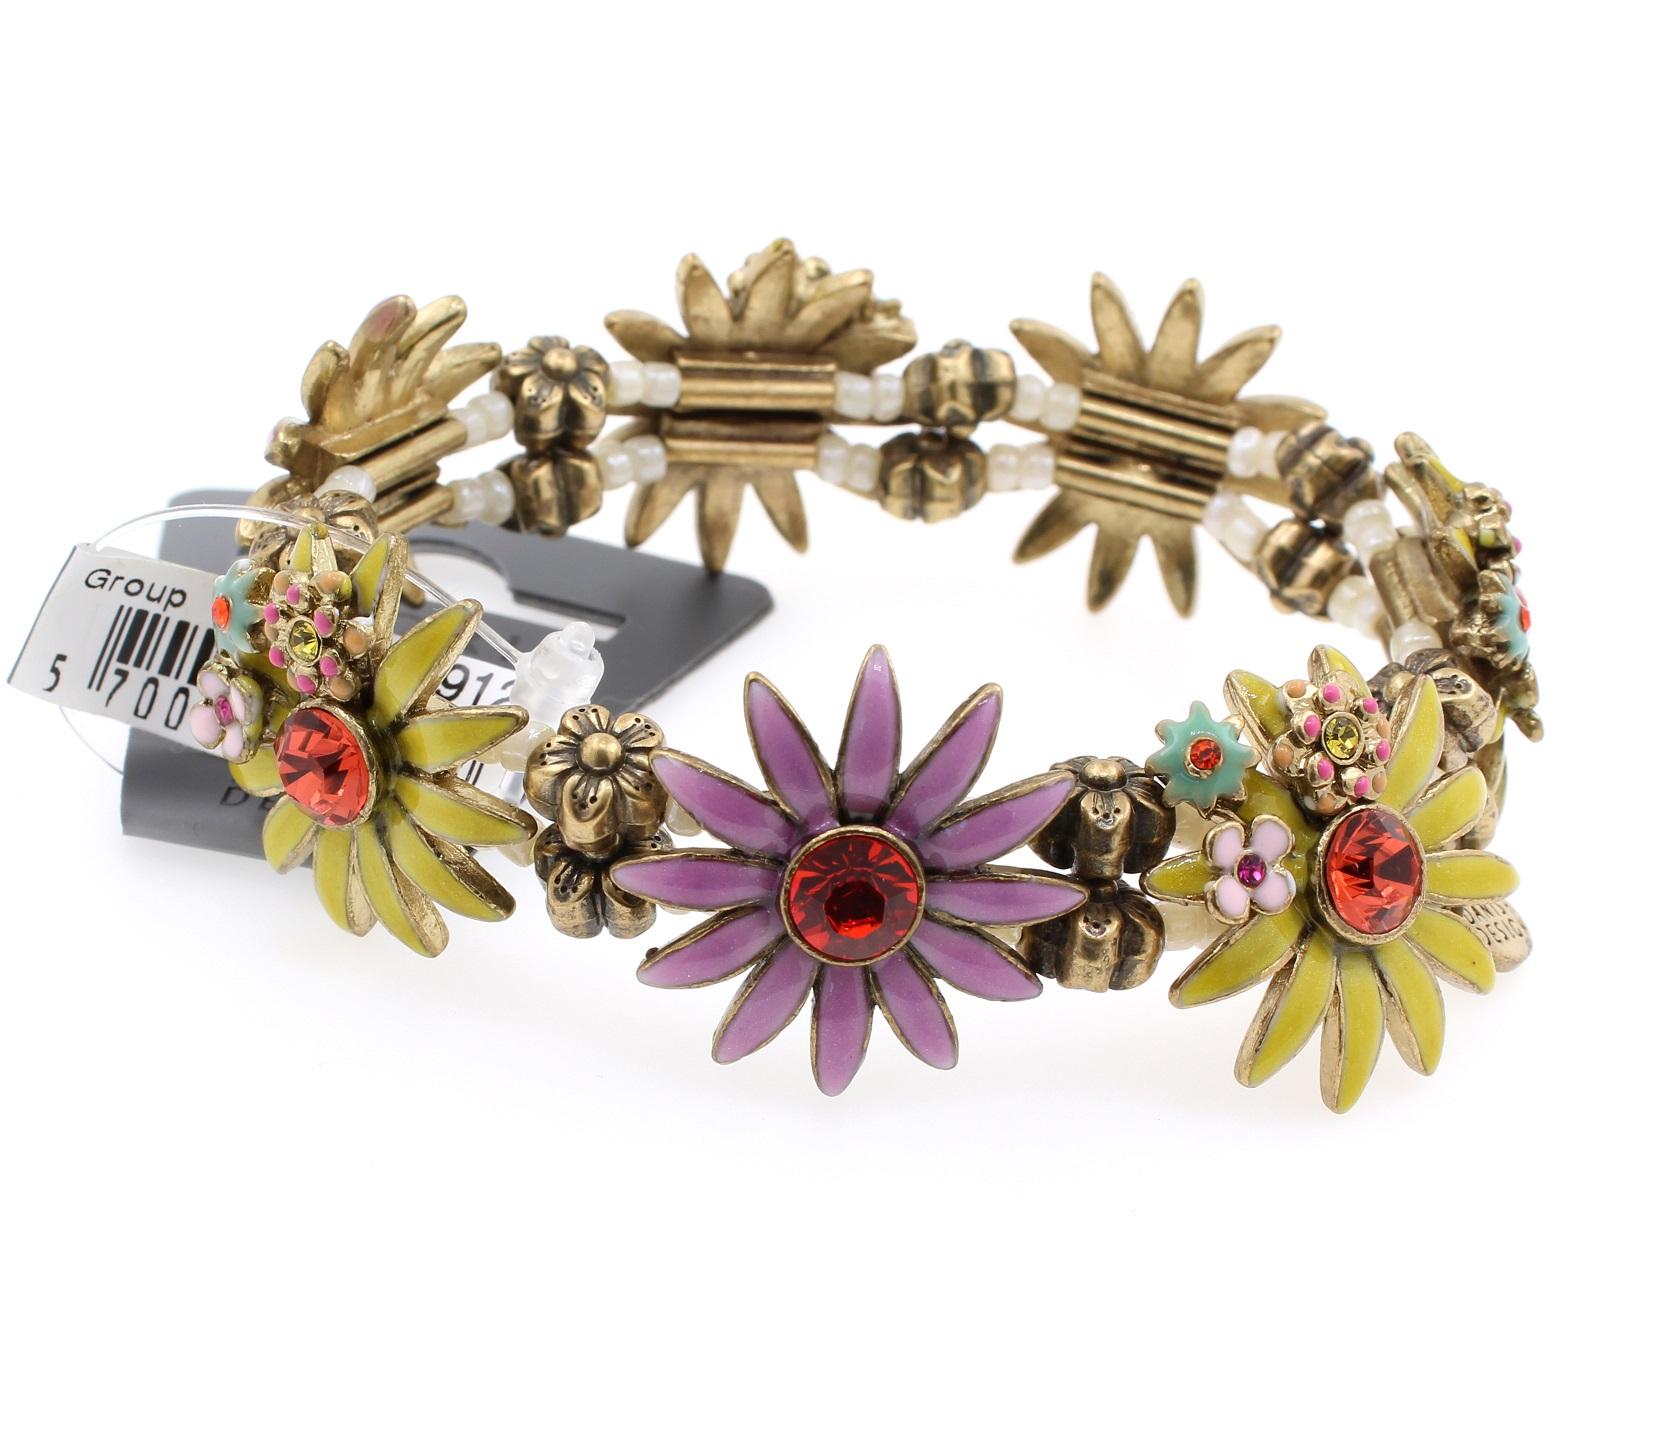 PILGRIM - Daisy - Stretch Bracelet - Oxidised Gold Plate/Yellow, Pink, Purple BNWT